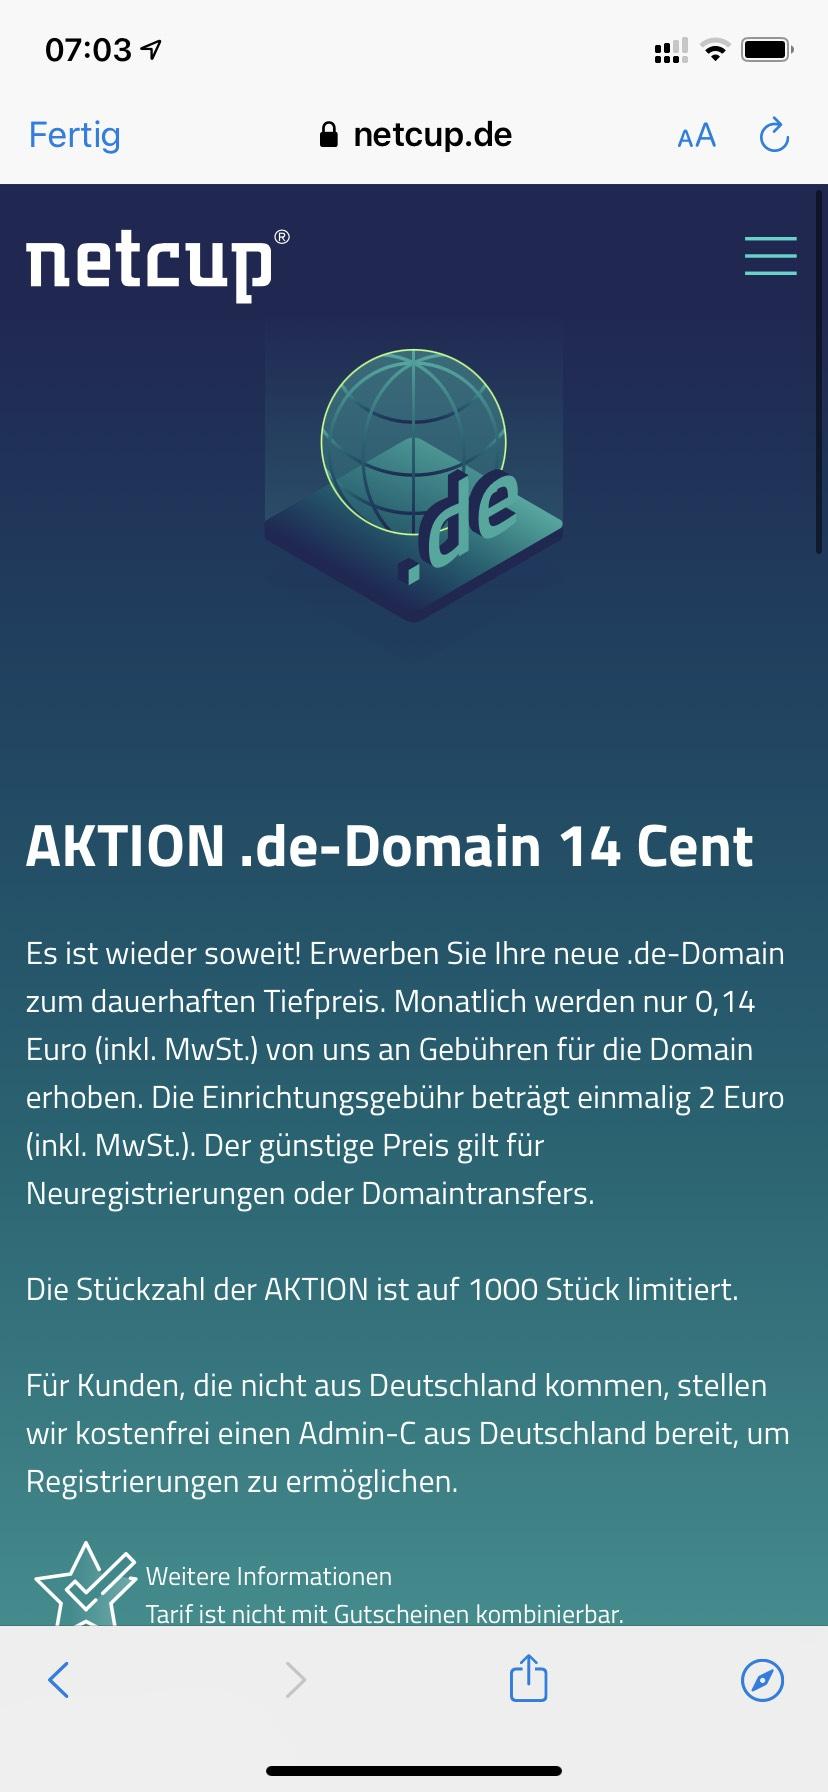 [netcup] .de Domain für 0,14€ pro Monat dauerhaft zzgl 2,00€ Einrichtung